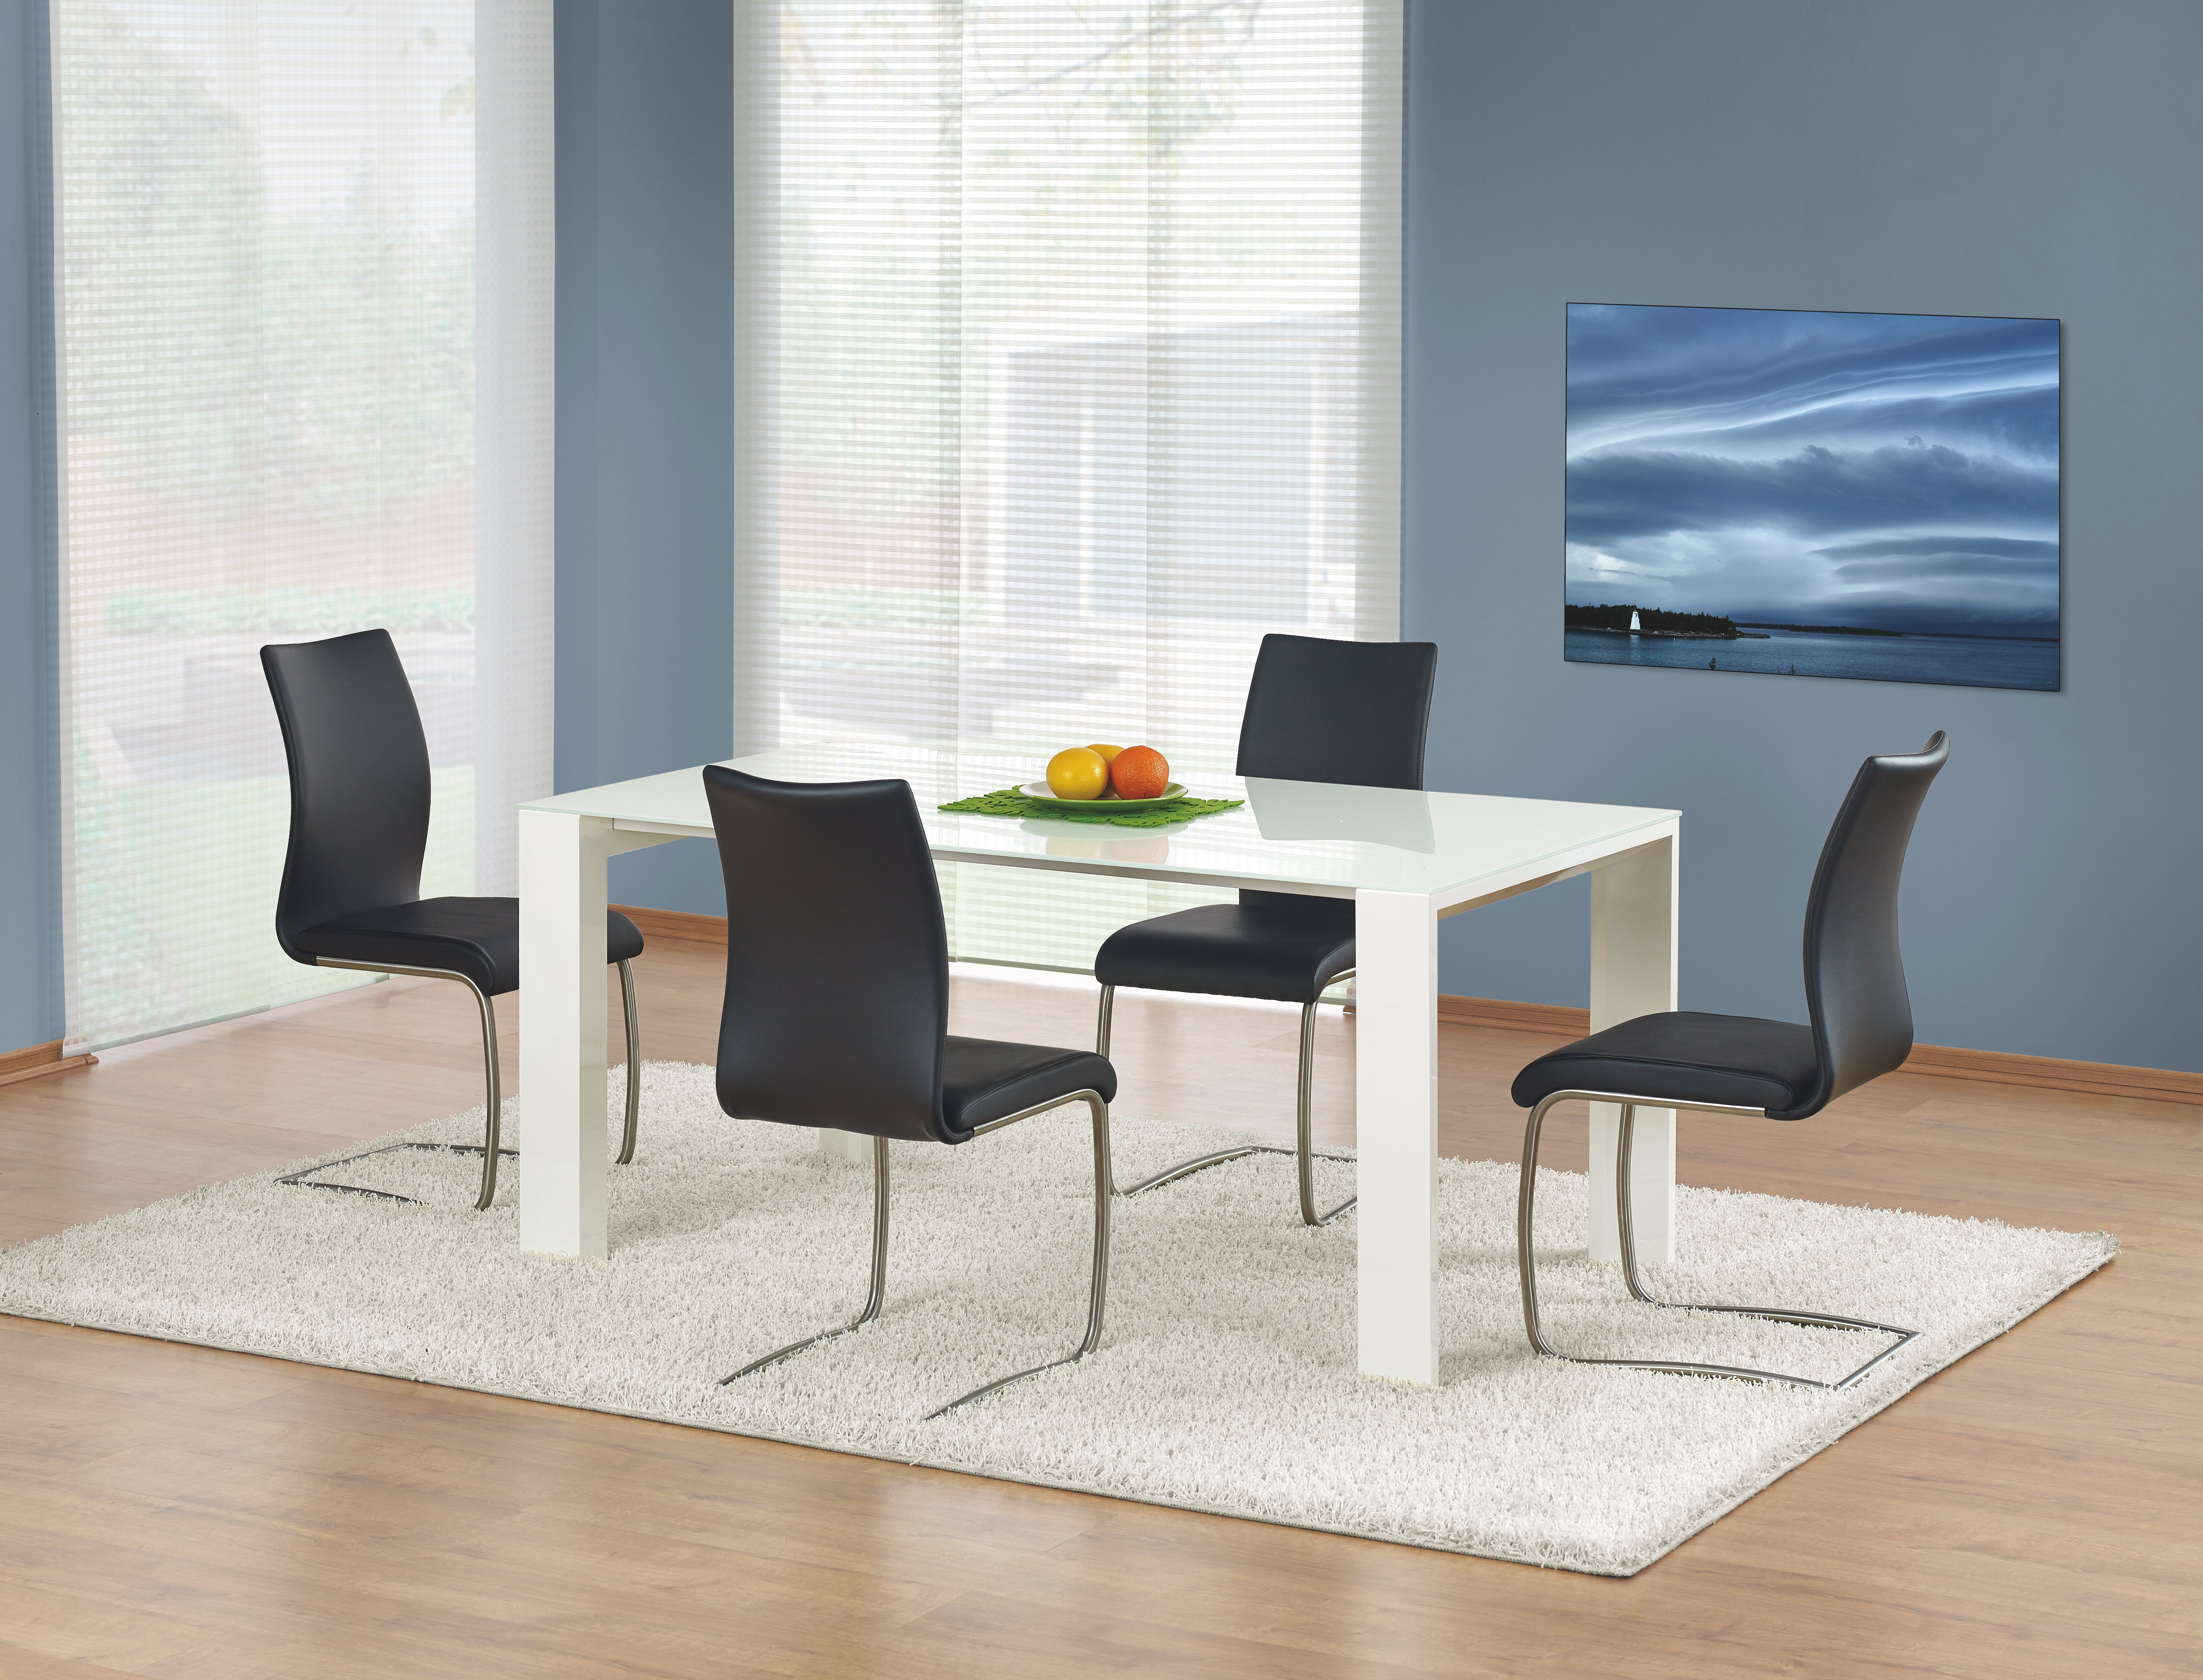 Jídelní stůl - Halmar - Jonas (pro 6 osob)